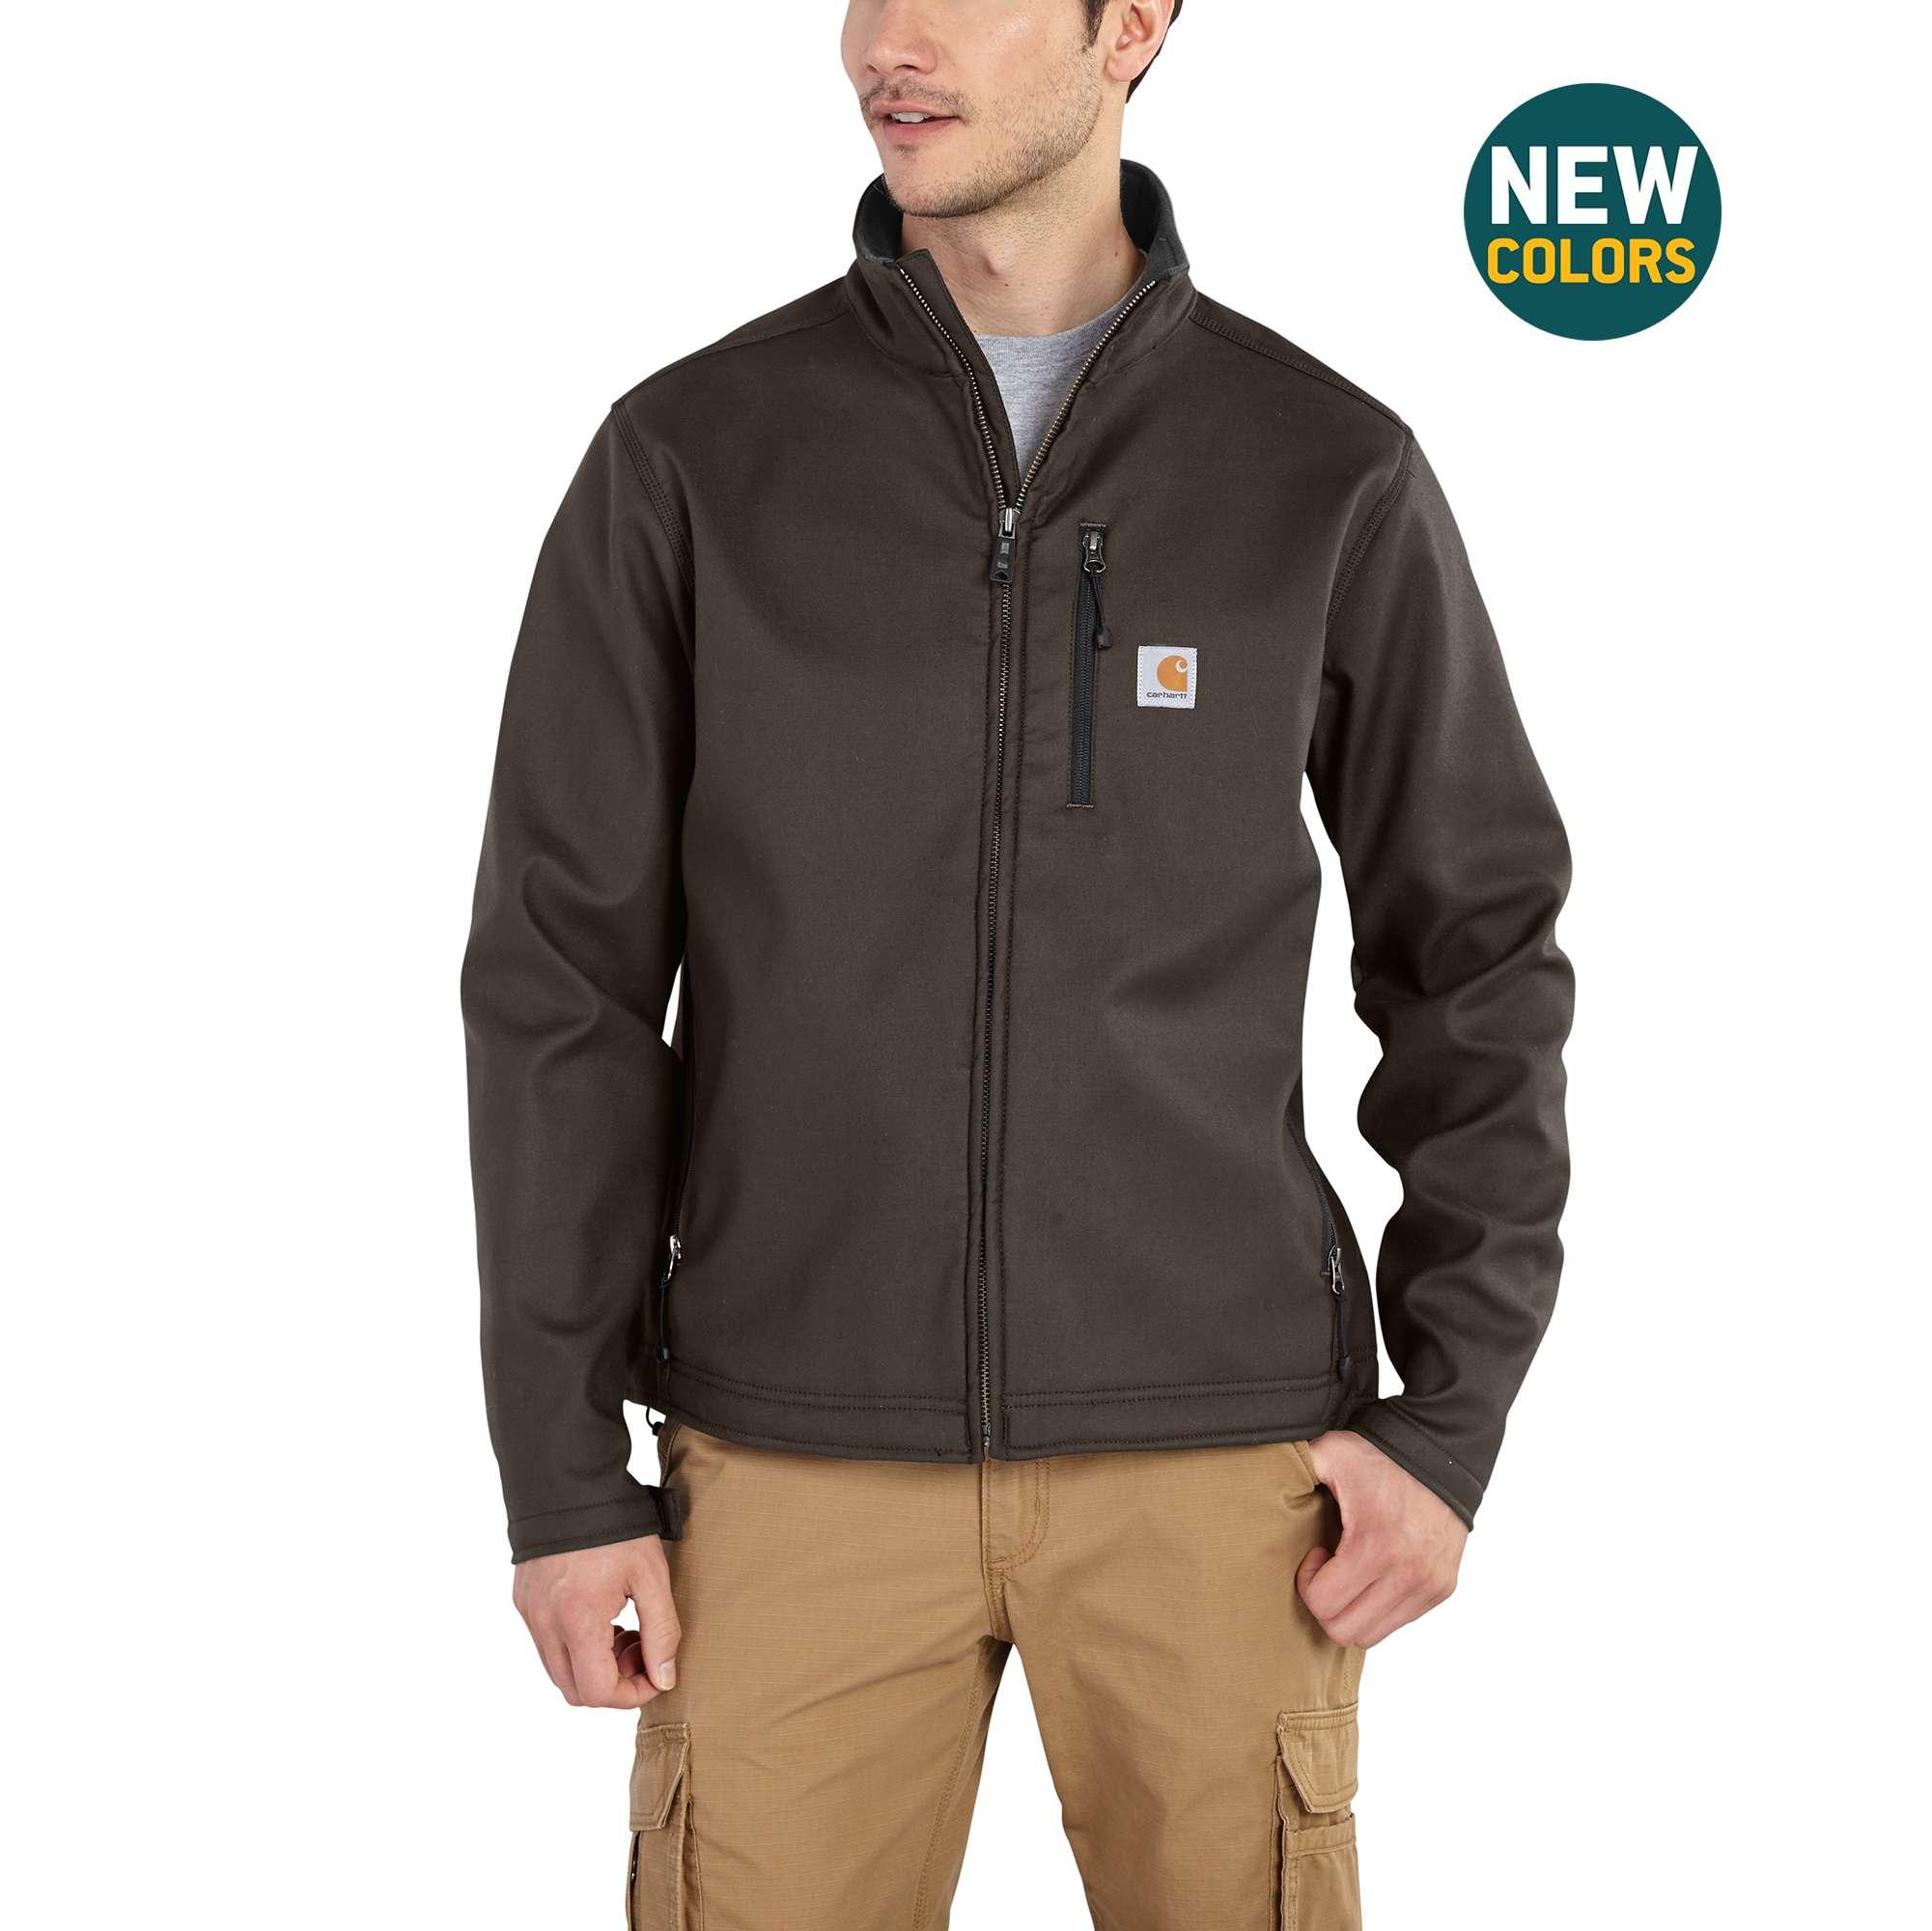 Carhartt Pineville Soft Shell Jacket